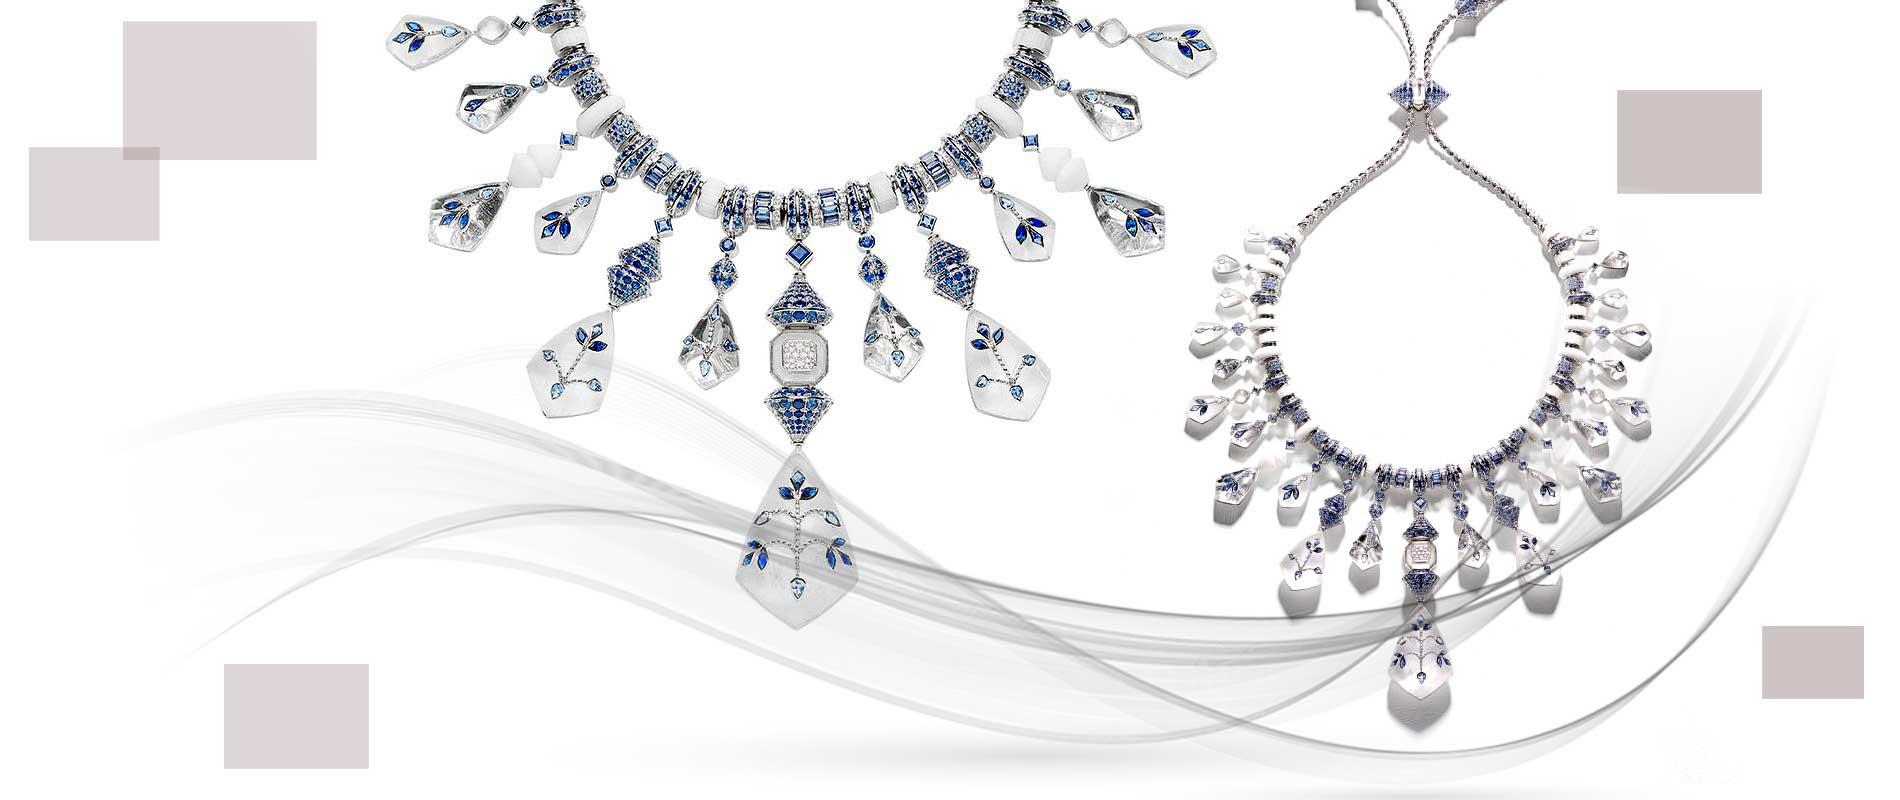 Jewellery designers 012 1 - استفاده از مواد اولیه غیر متعارف در جواهر سازی